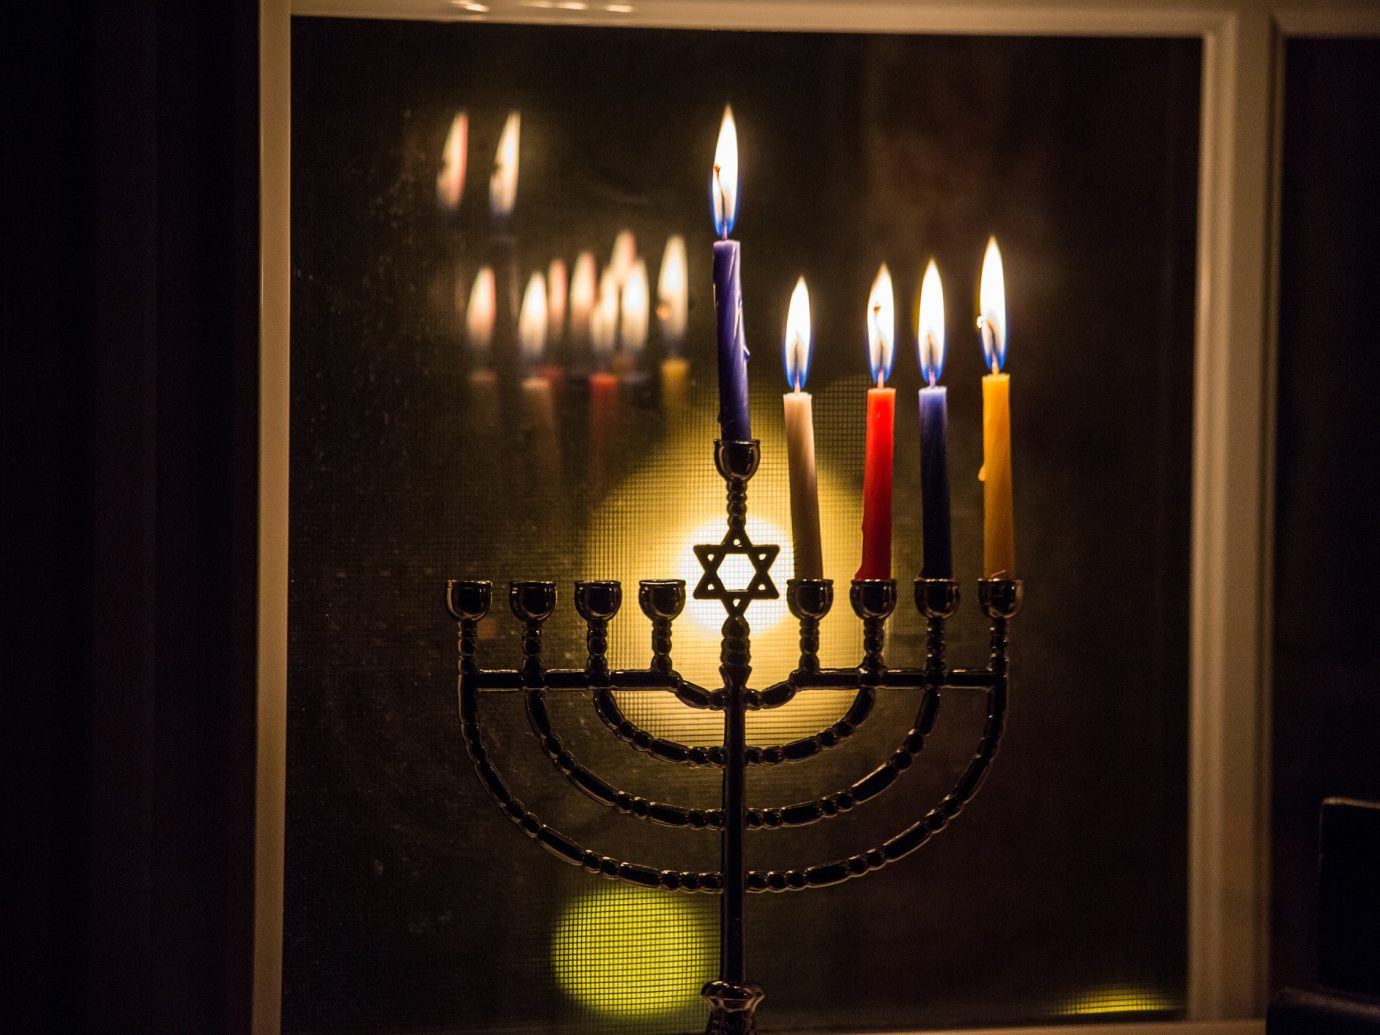 Trip Ideas candelabrum indoor candle light darkness lighting lit glass symmetry hanukkah